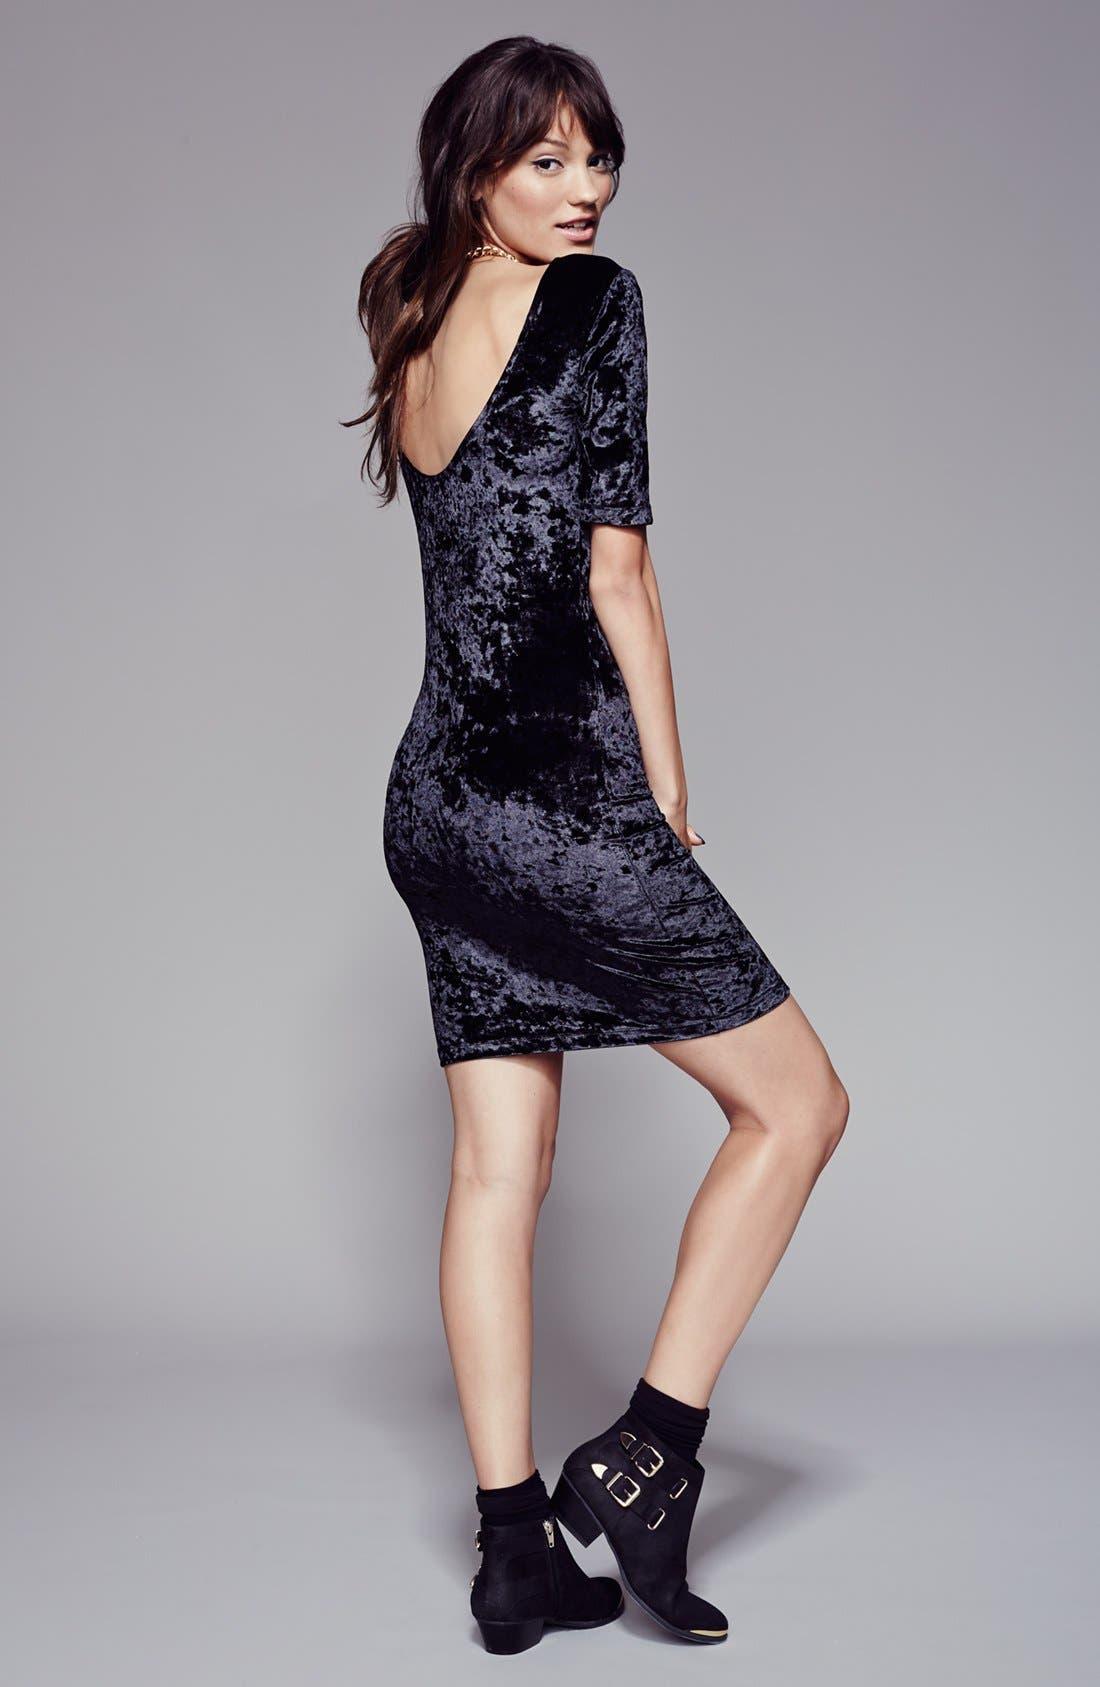 Main Image - Frenchi® Dress & Accessories